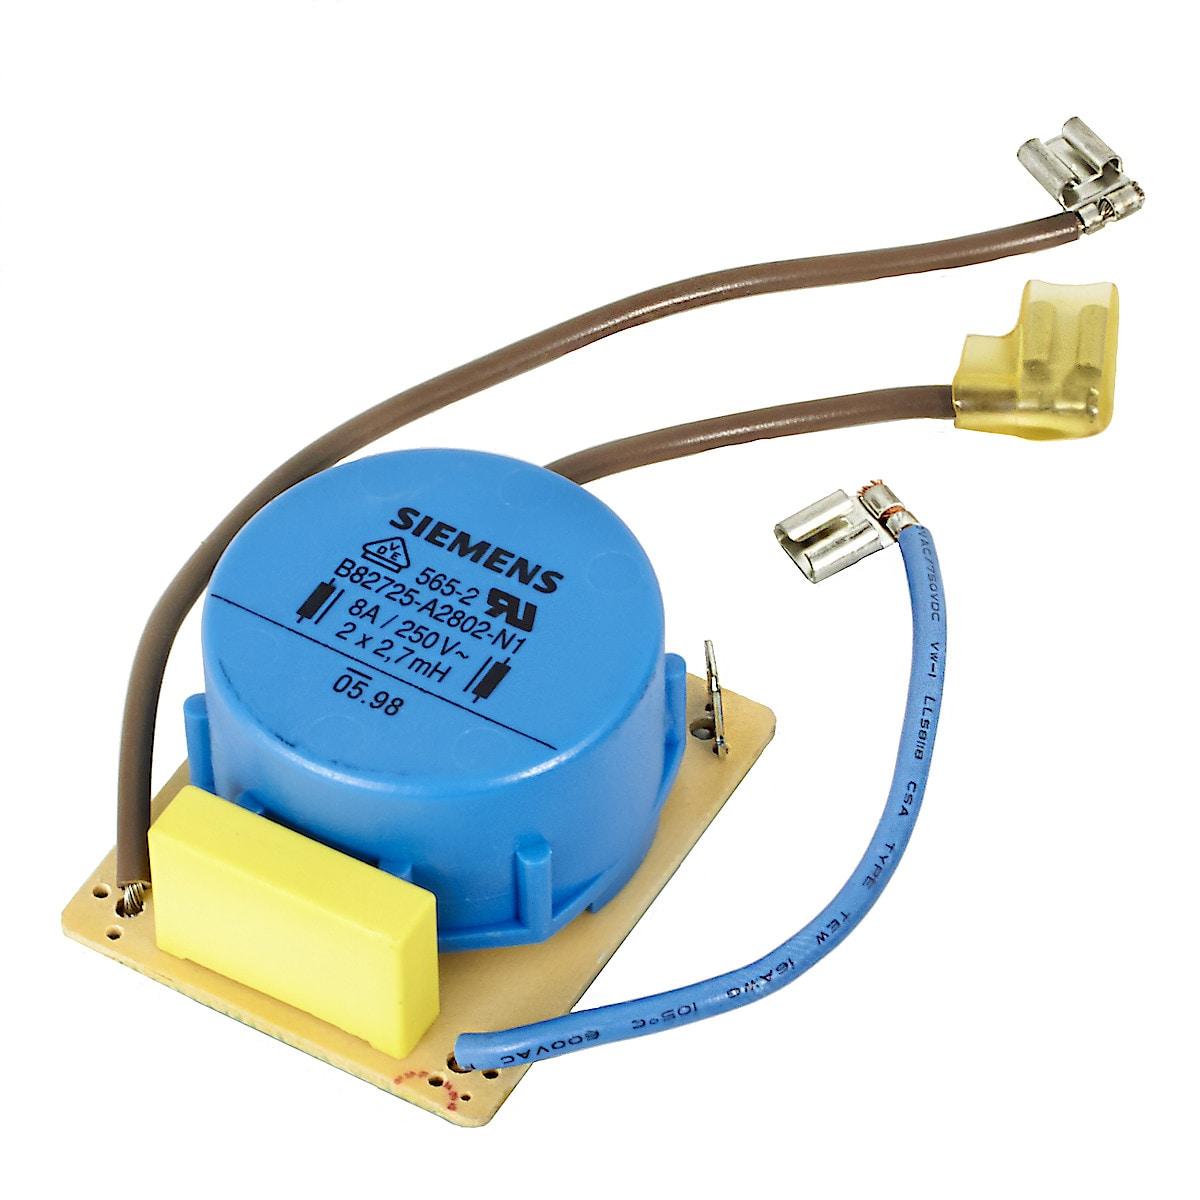 Støyfilter Siemens 565-2